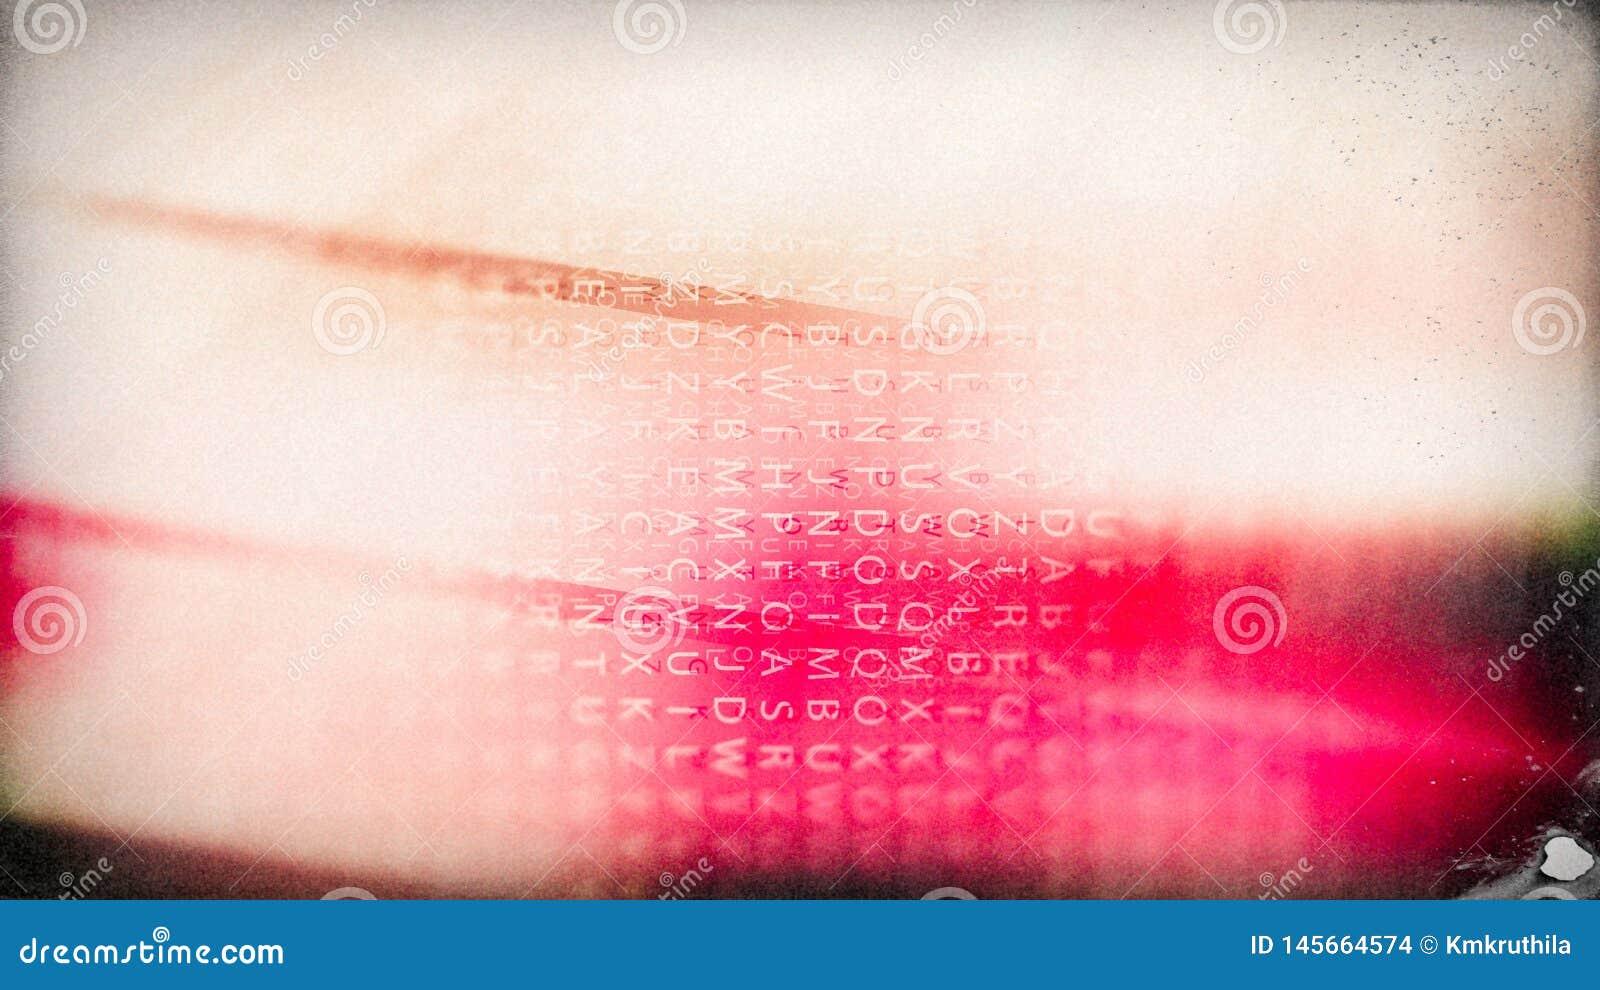 Lip Red Pink Beautiful Elegant Illustration Graphic Art Design Background Stock Illustration Illustration Of Water Illustration 145664574